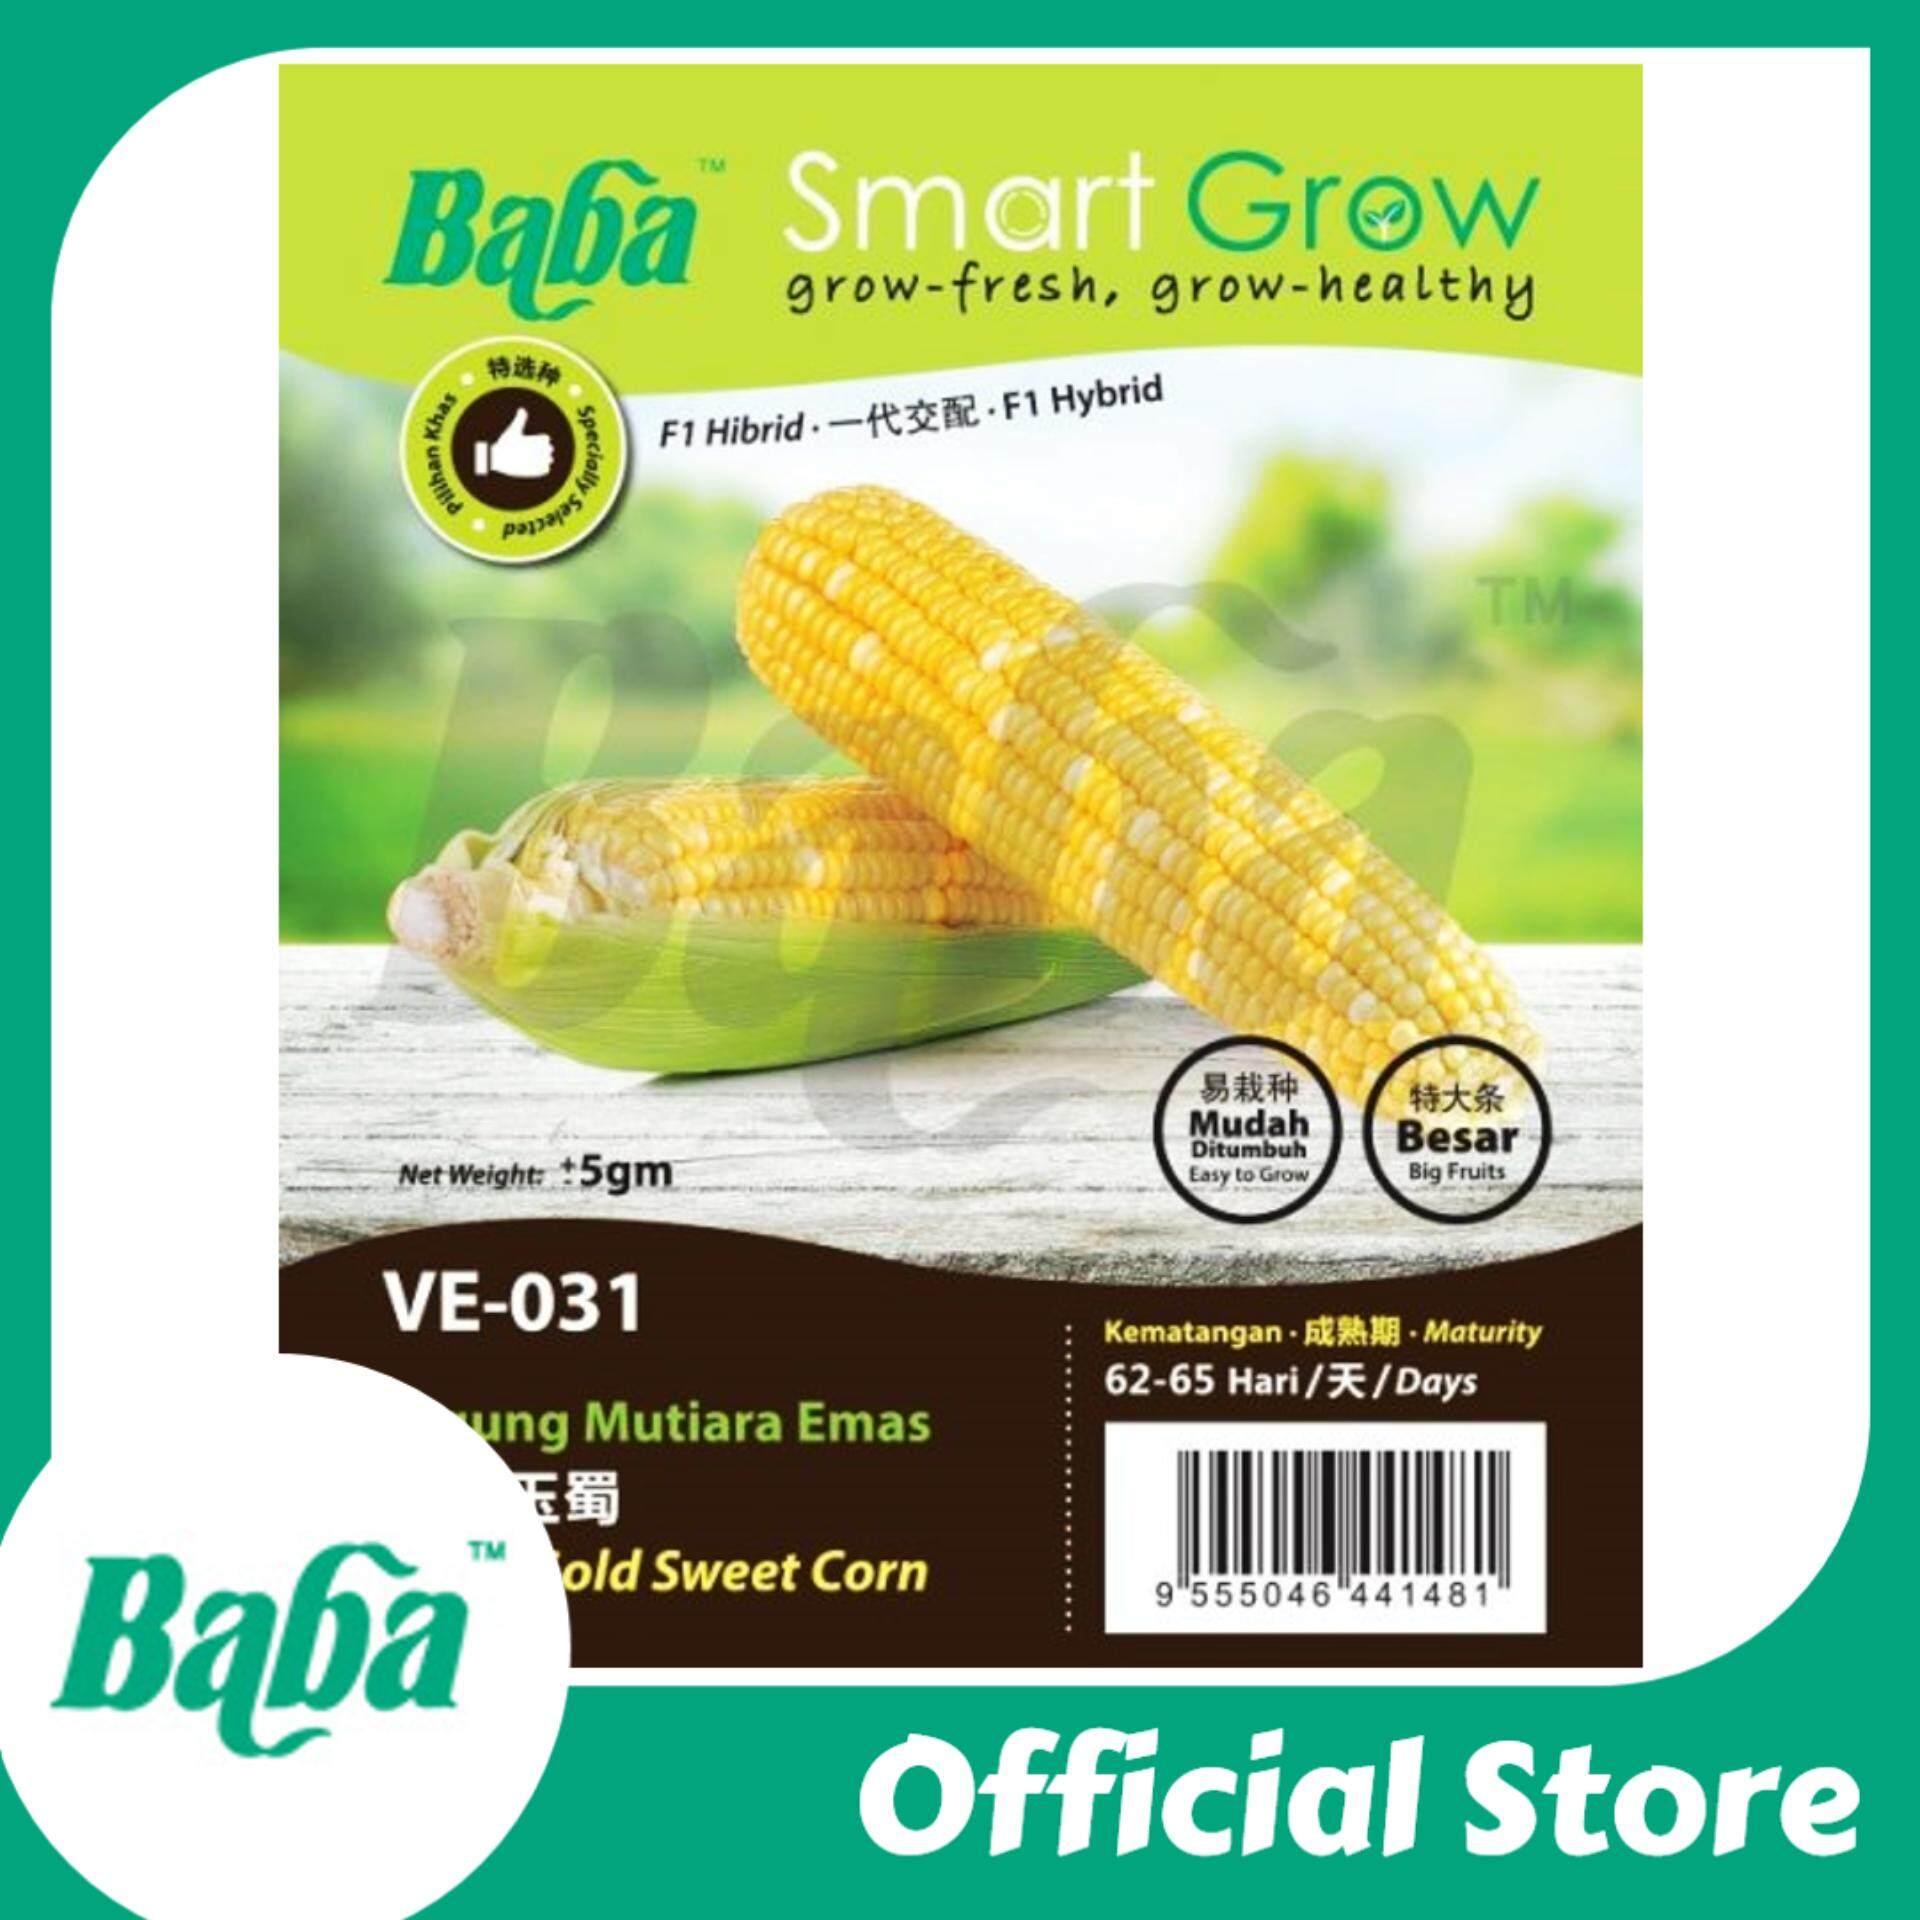 Baba VE-031 Smart Grow Pearl Gold Sweet Corn Seed - Vegetable Seed [5g]